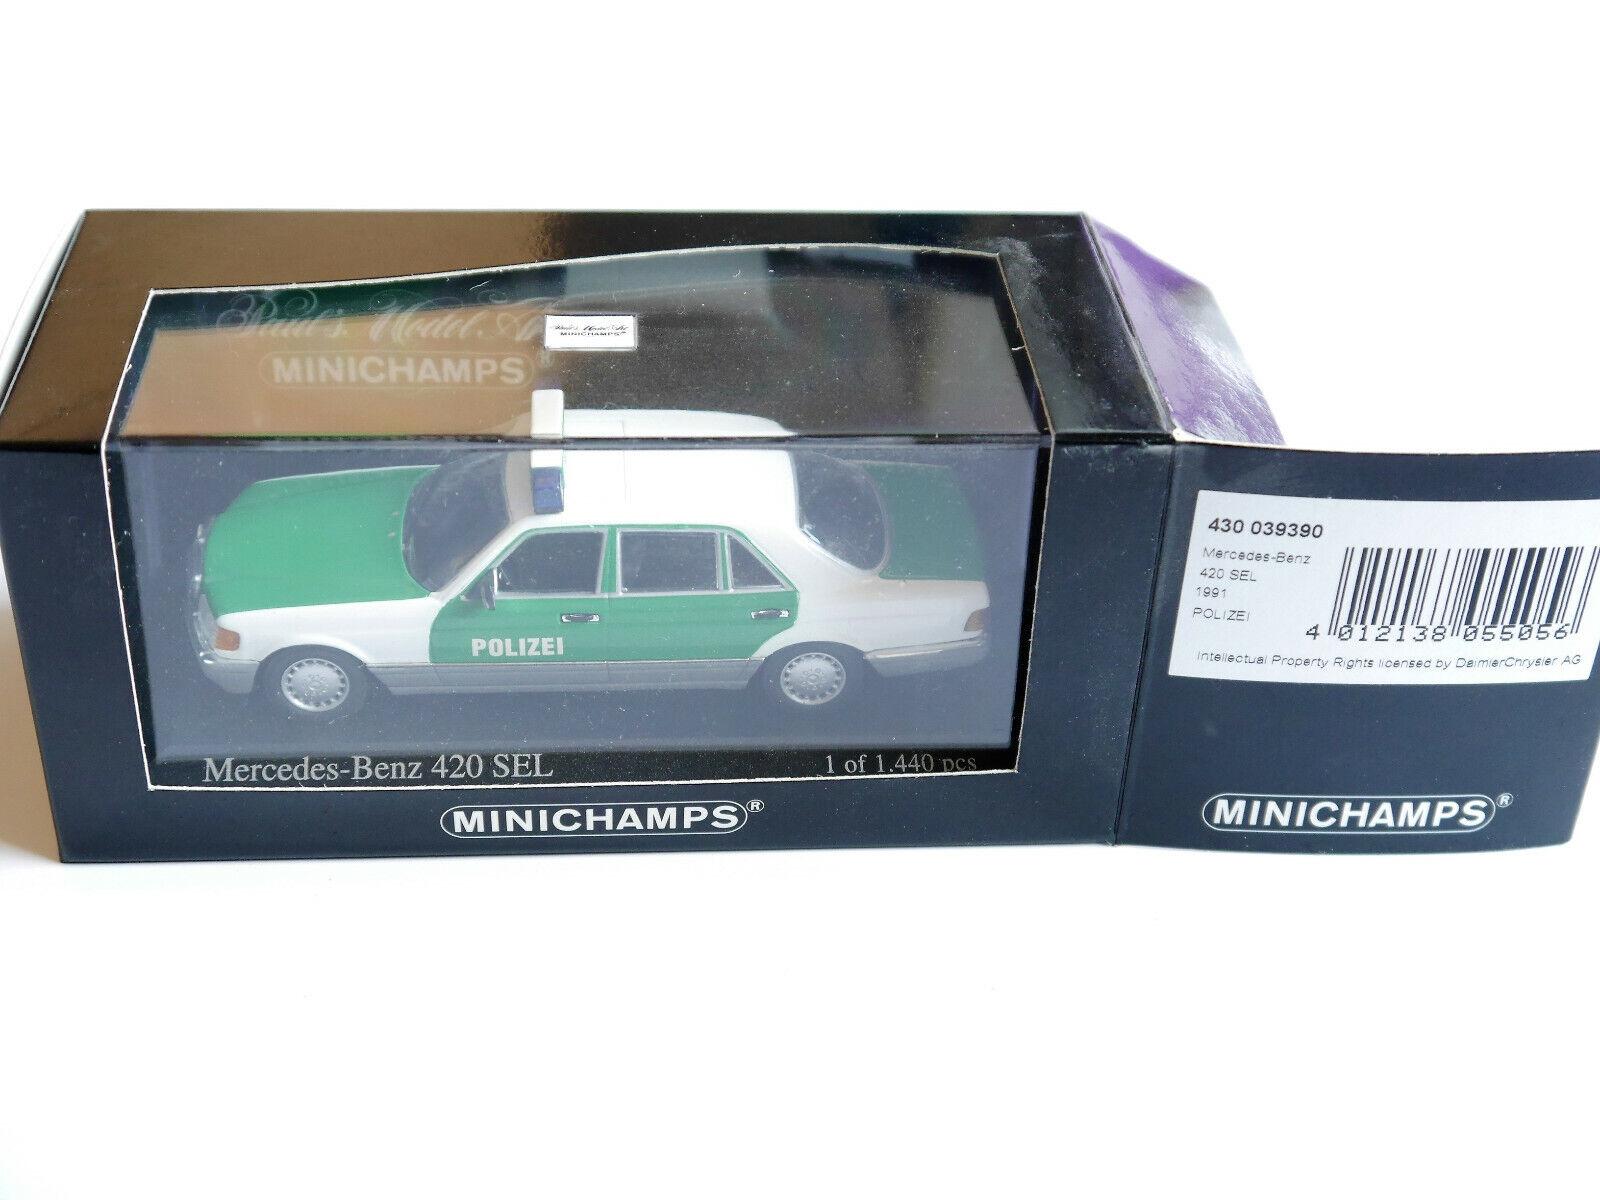 Mercedes W 126 S Classe 420 SEL 1991 Police Police Polis, Minichamps 1 43 en Boîte